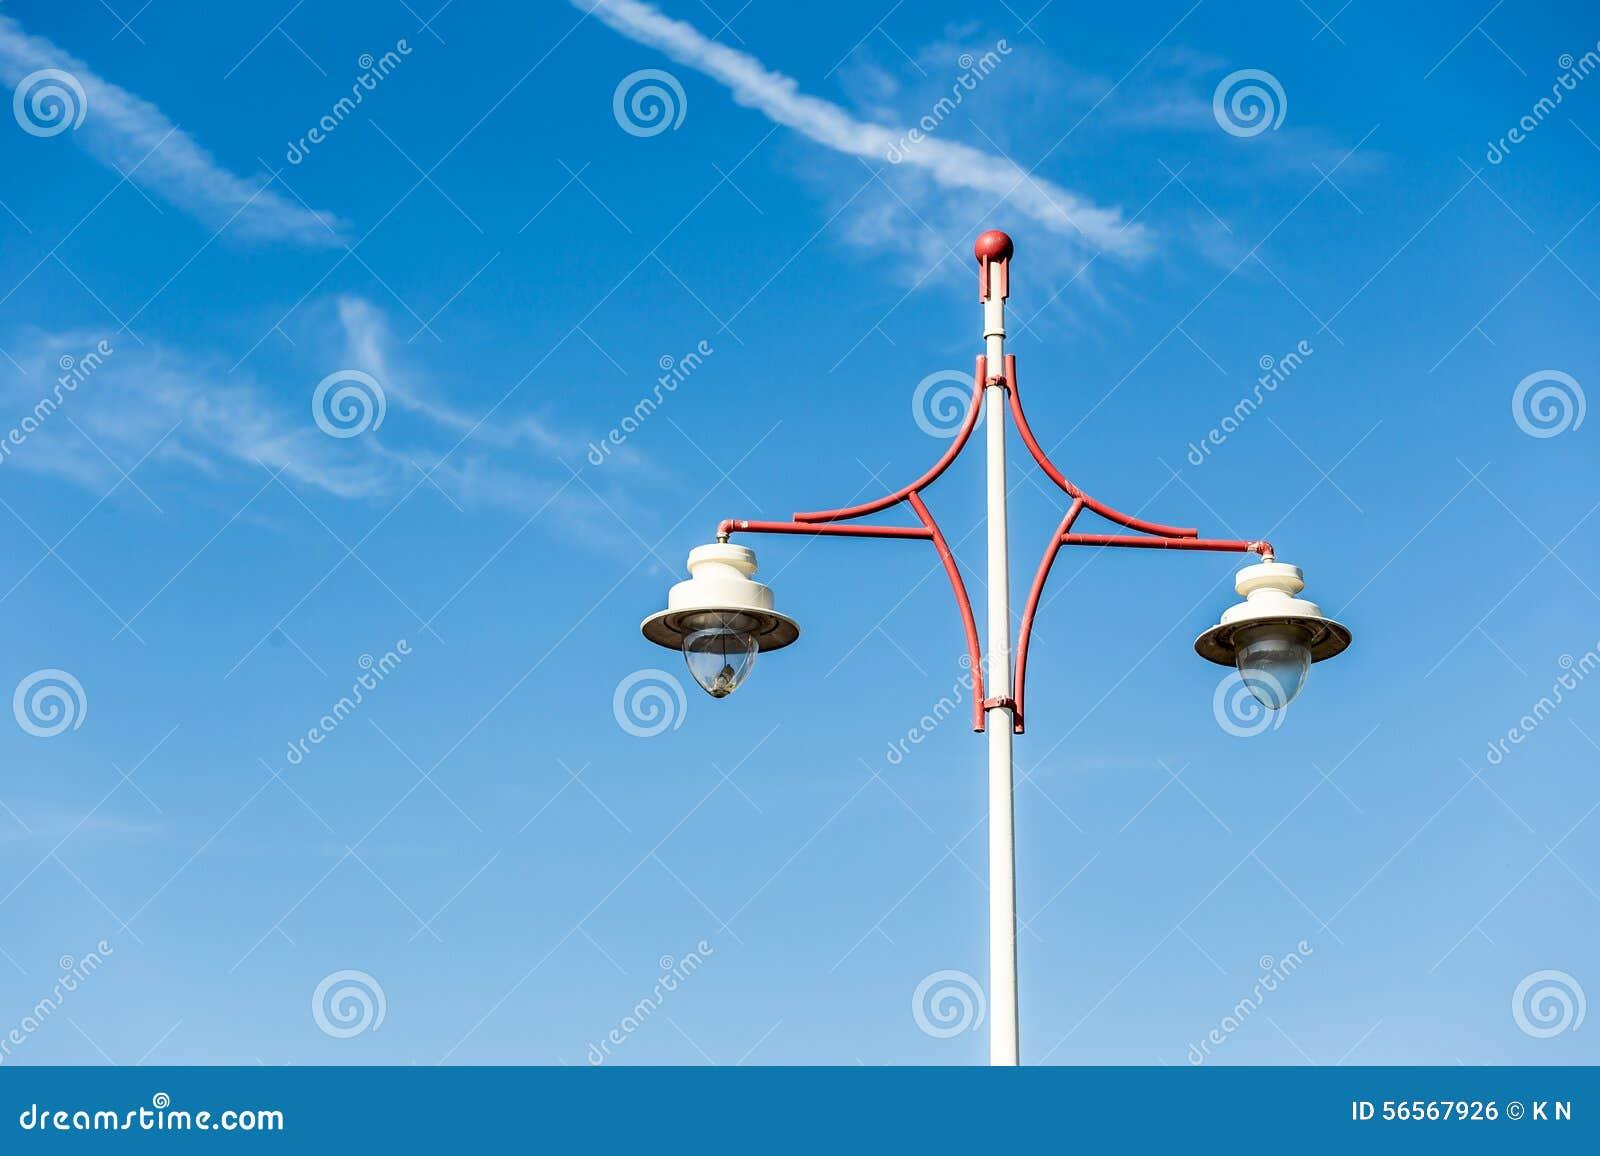 Download Μετα φως Latern σε έναν μπλε ουρανό με ακριβώς μερικά σύννεφα Στοκ Εικόνες - εικόνα από λιμάνι, netherlands: 56567926